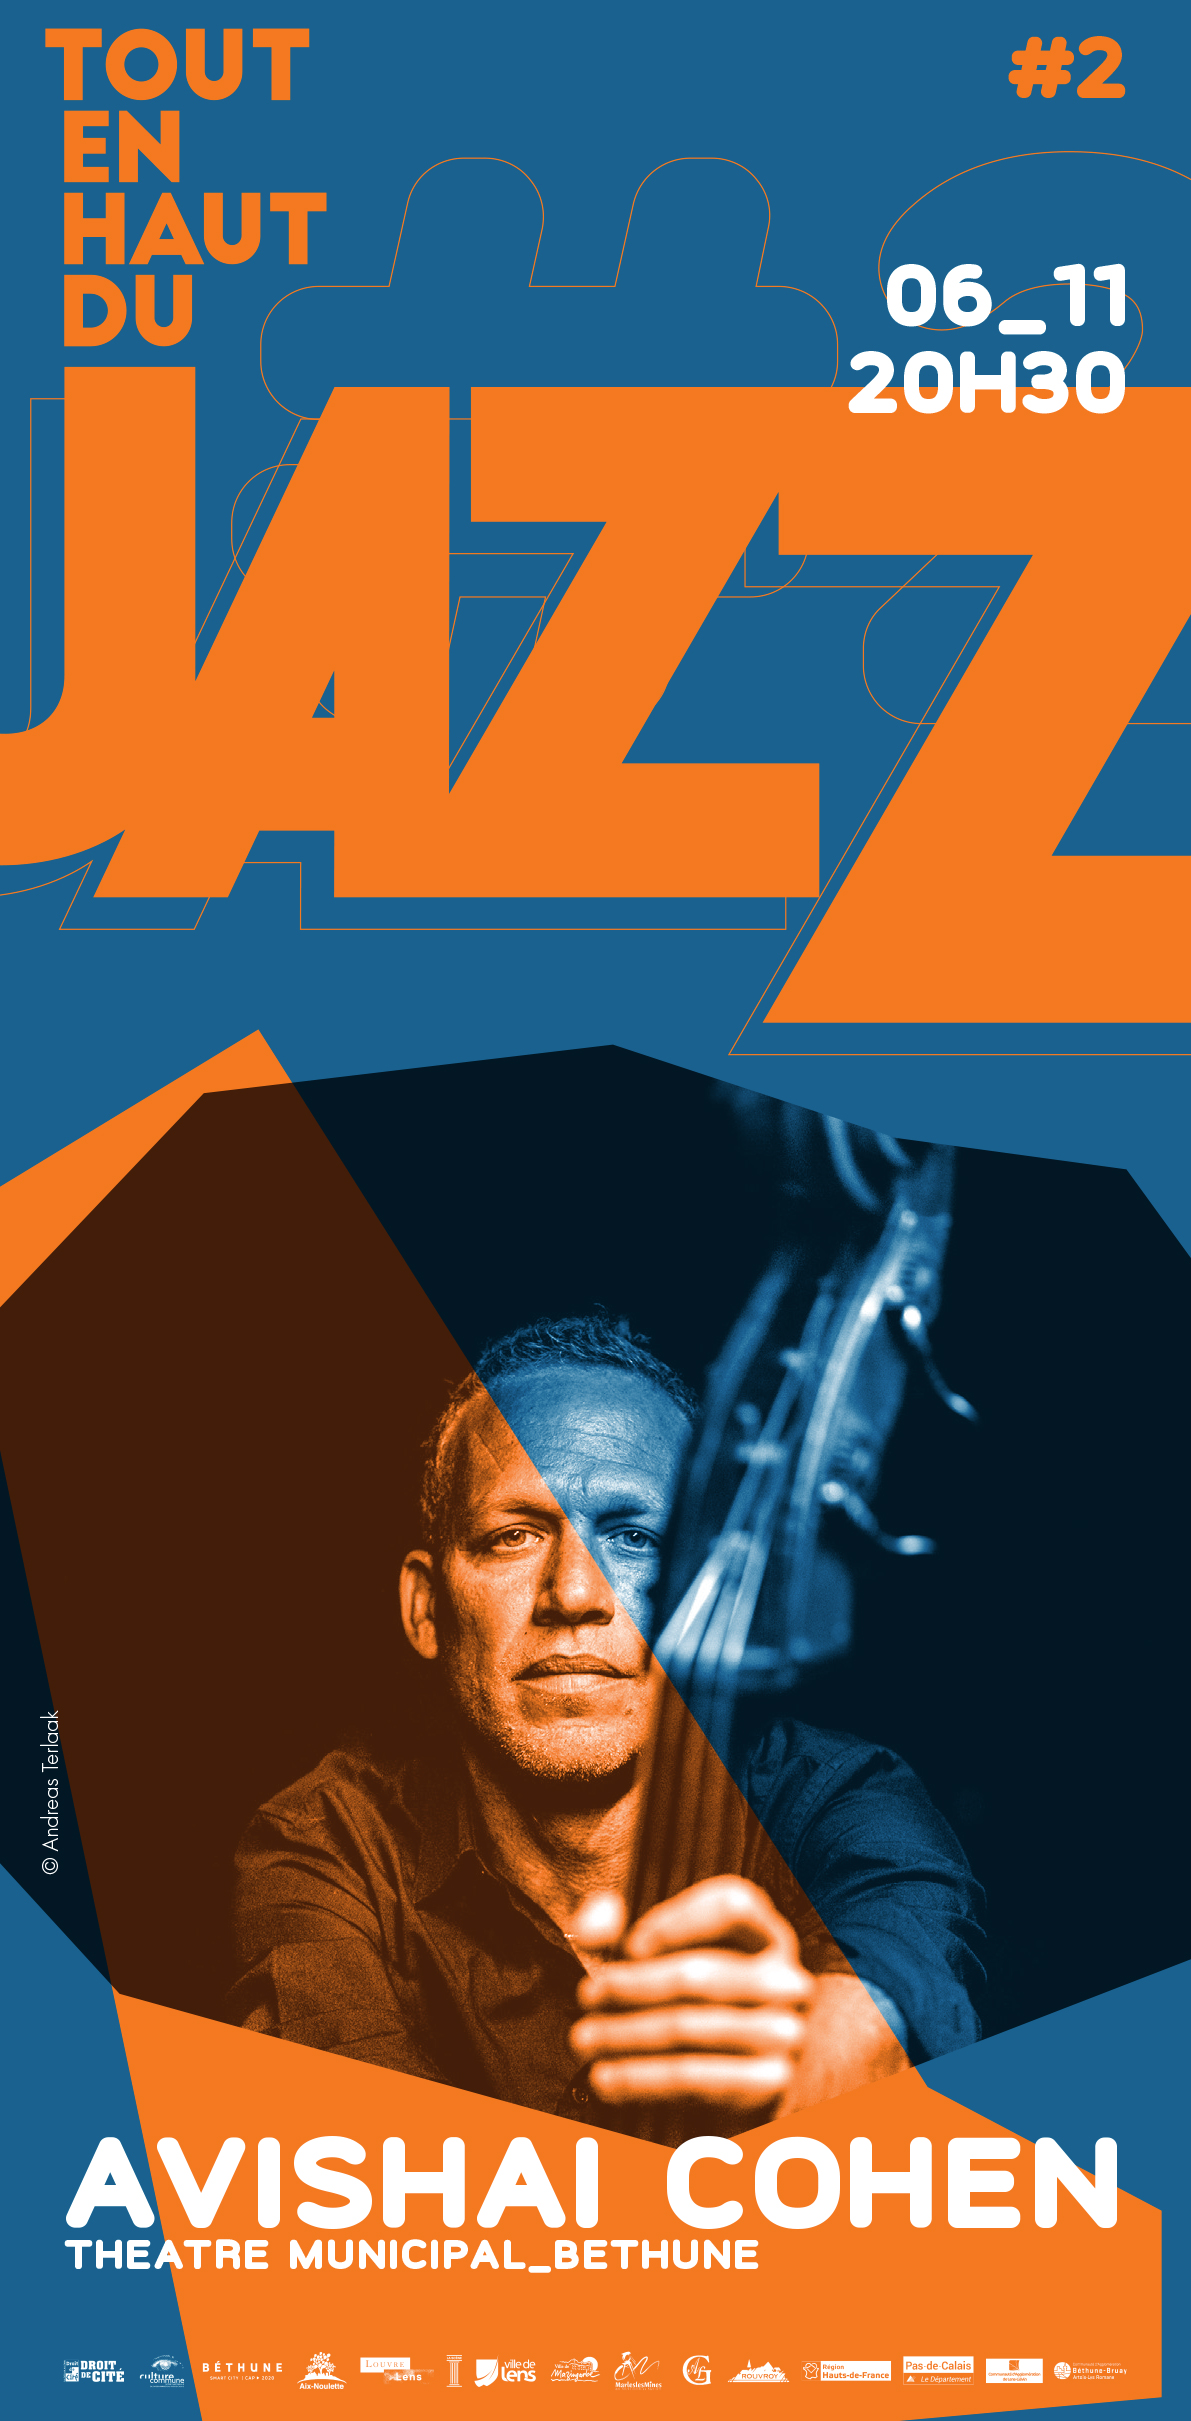 Avishaï Cohen – Festival tout en haut du jazz